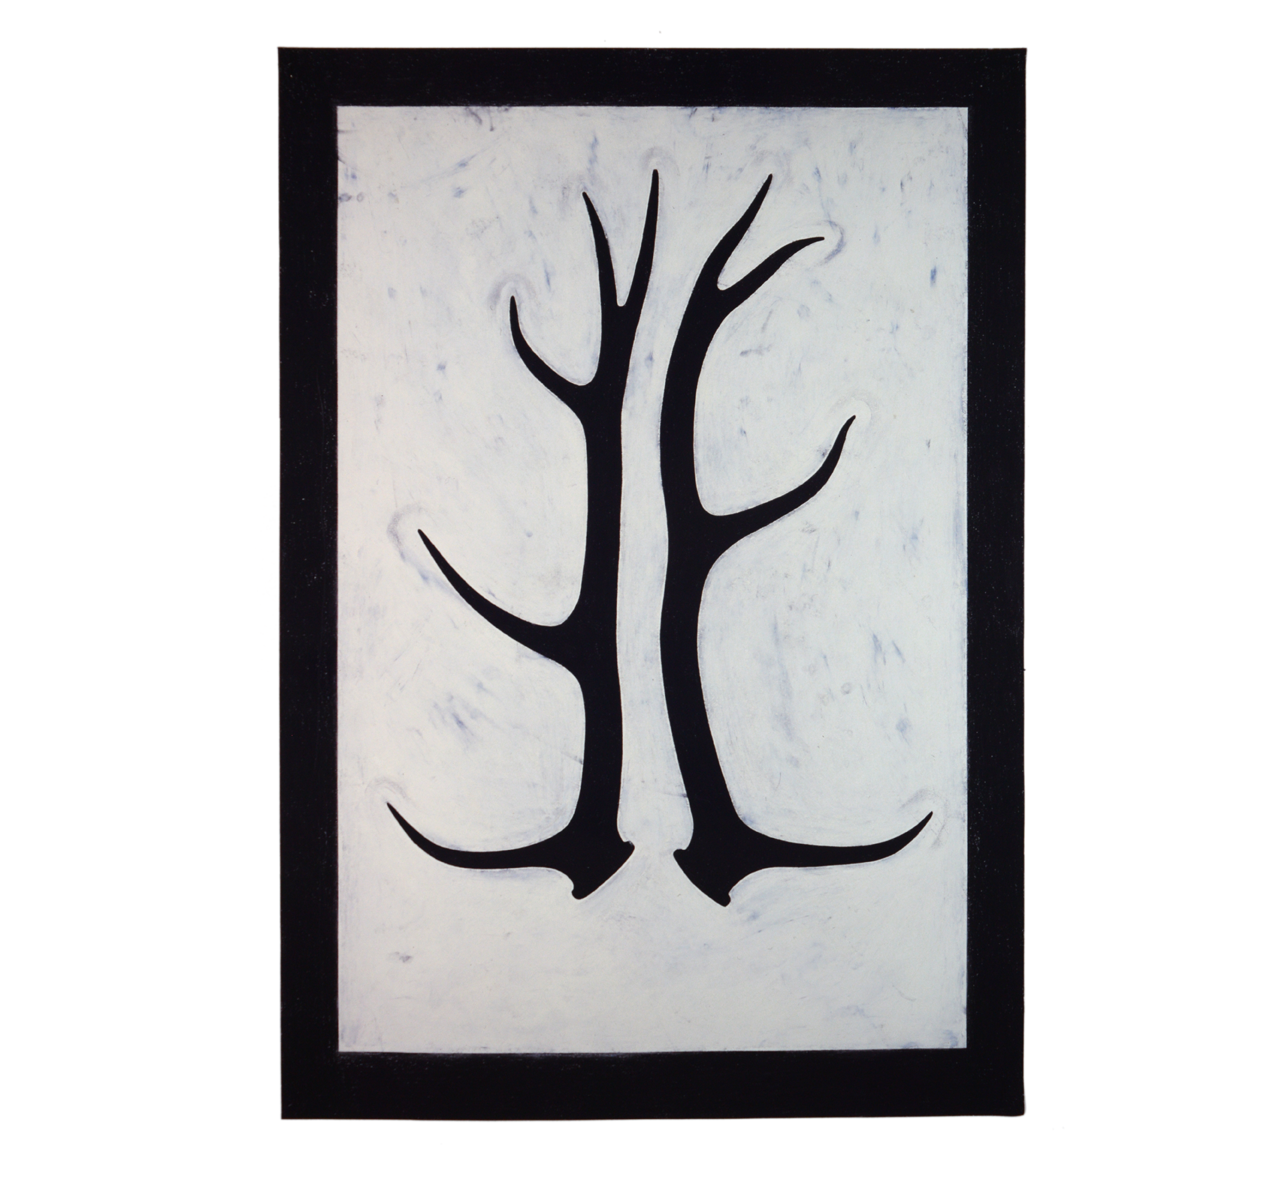 """Ramure"" 1981, fusain, craie grasse sur papier, 157 x 115 cm - Photo Hadler/Stuhr"